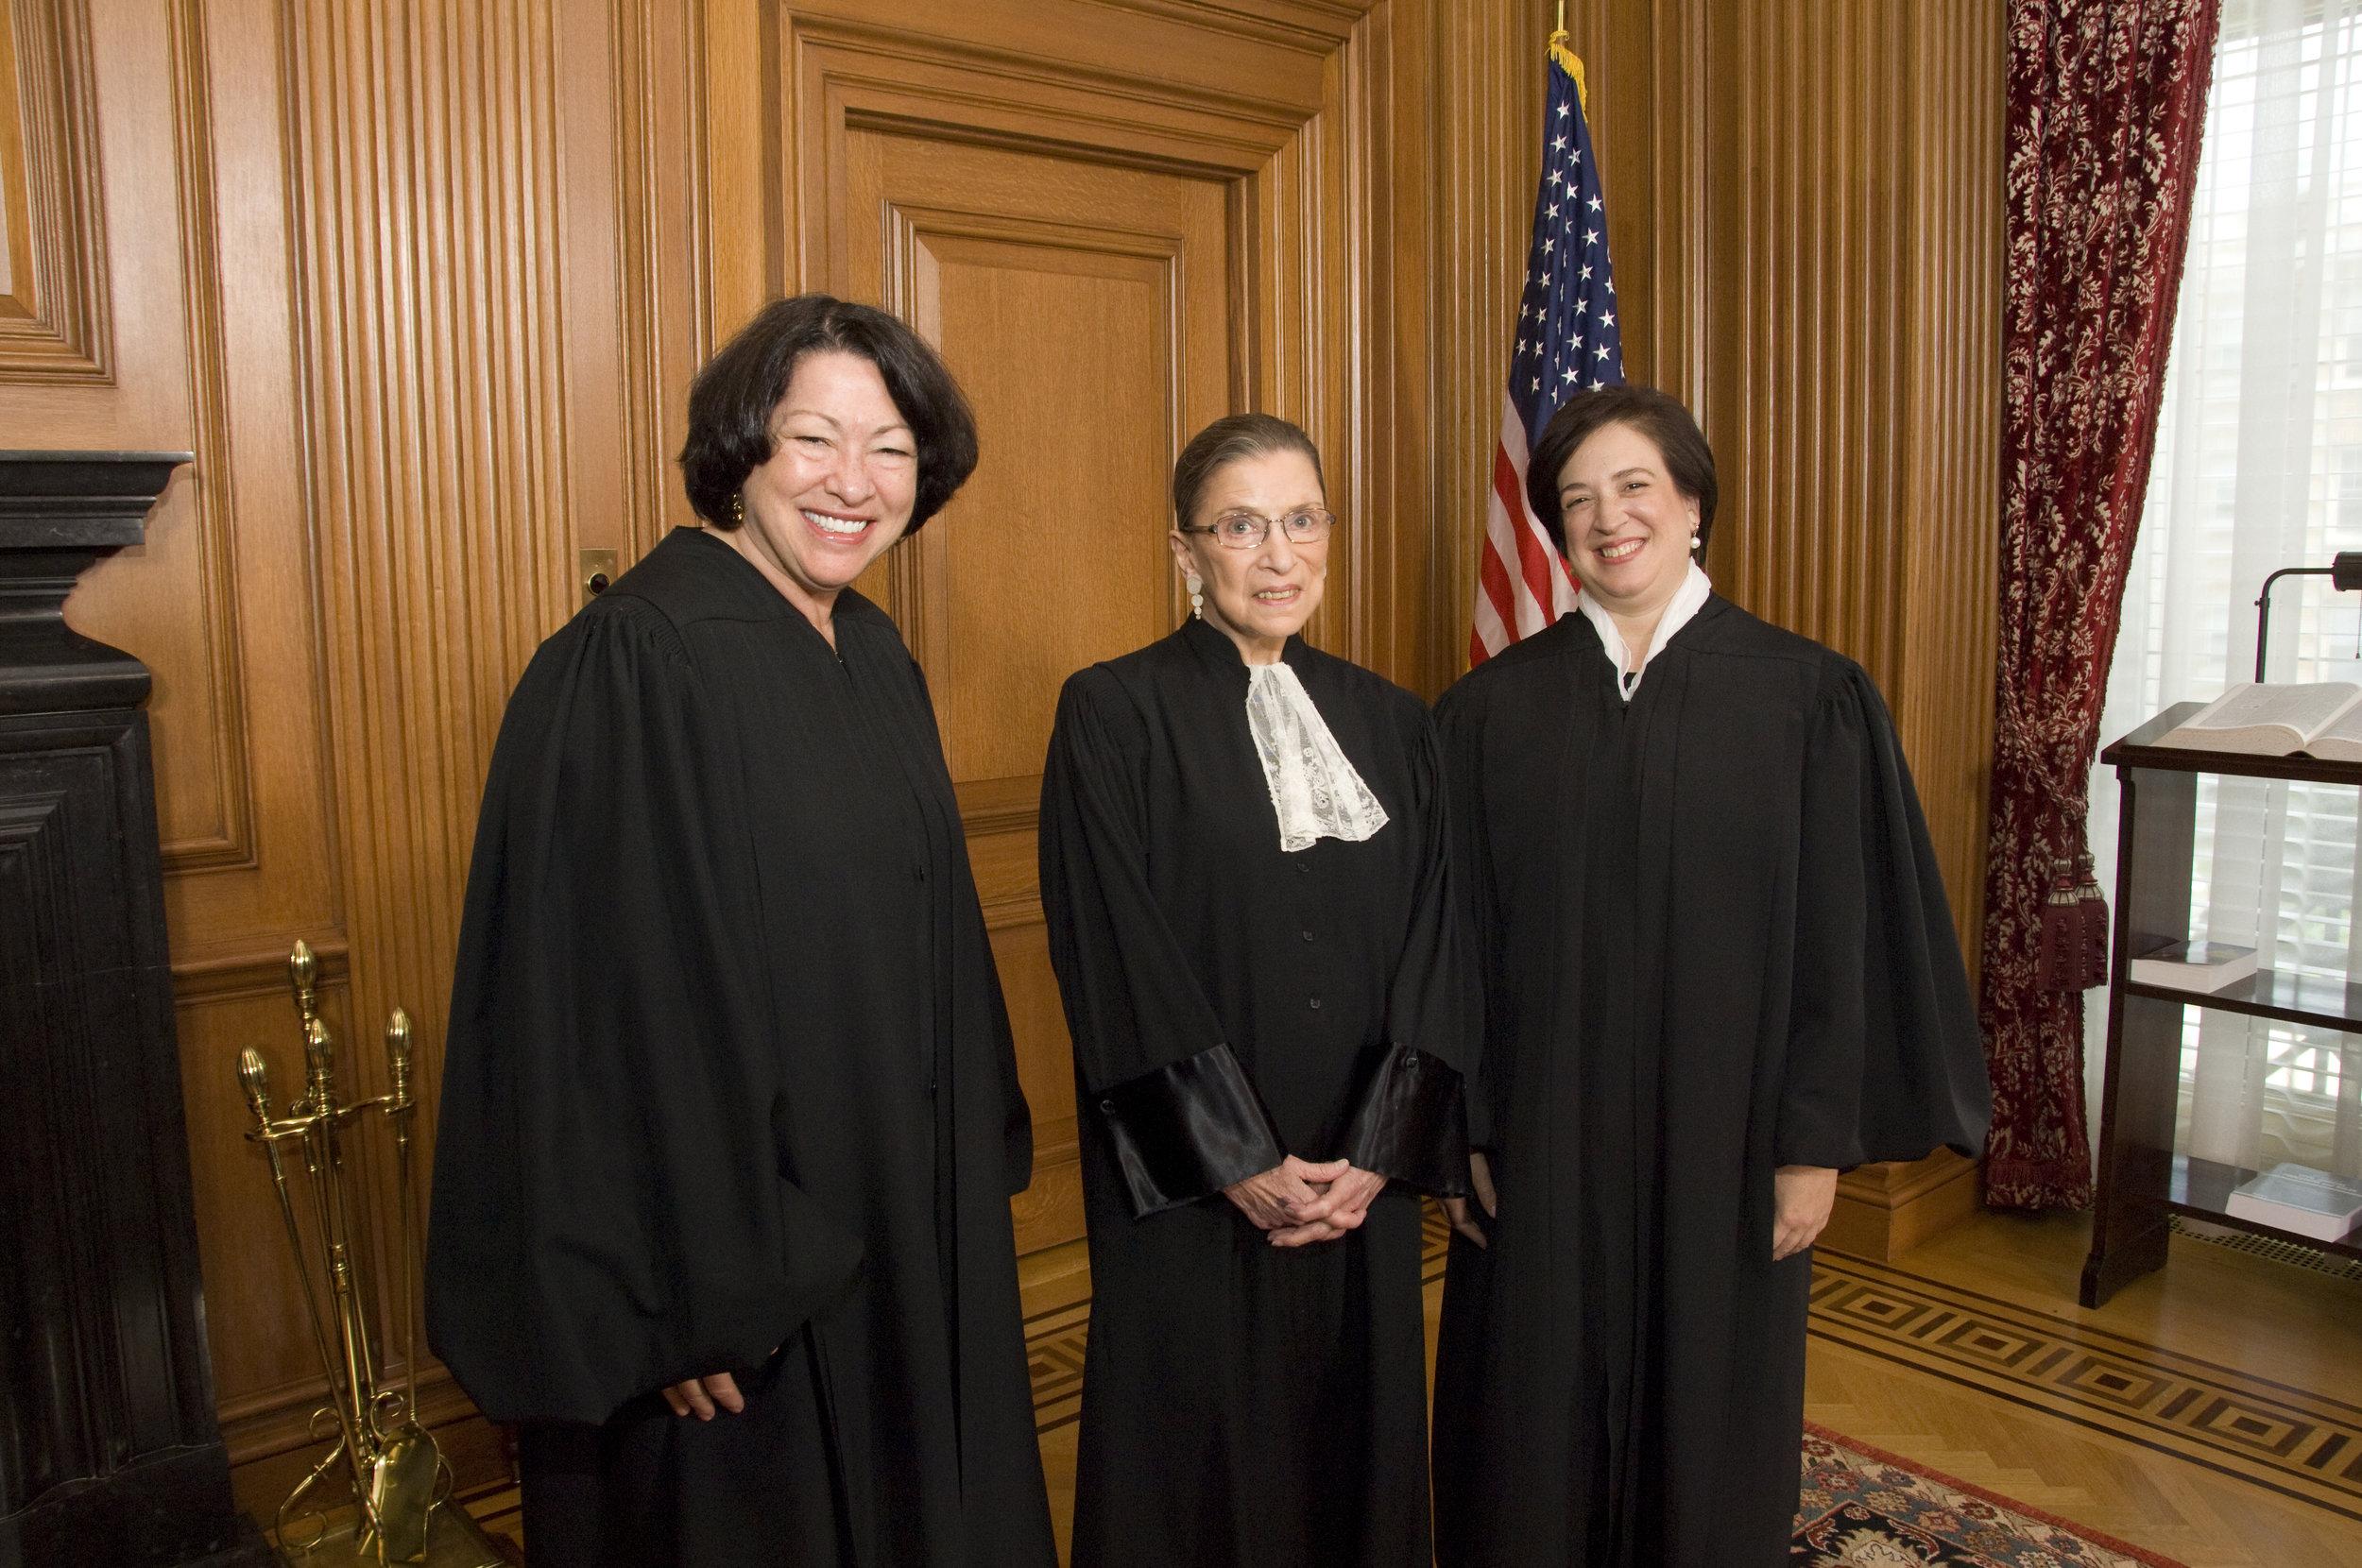 Supreme Court Justices Sonia Sotomayor, Ruth Bader Ginsburg and Elena Kagan (Photo: Steve Petteway /   Wikimedia   )